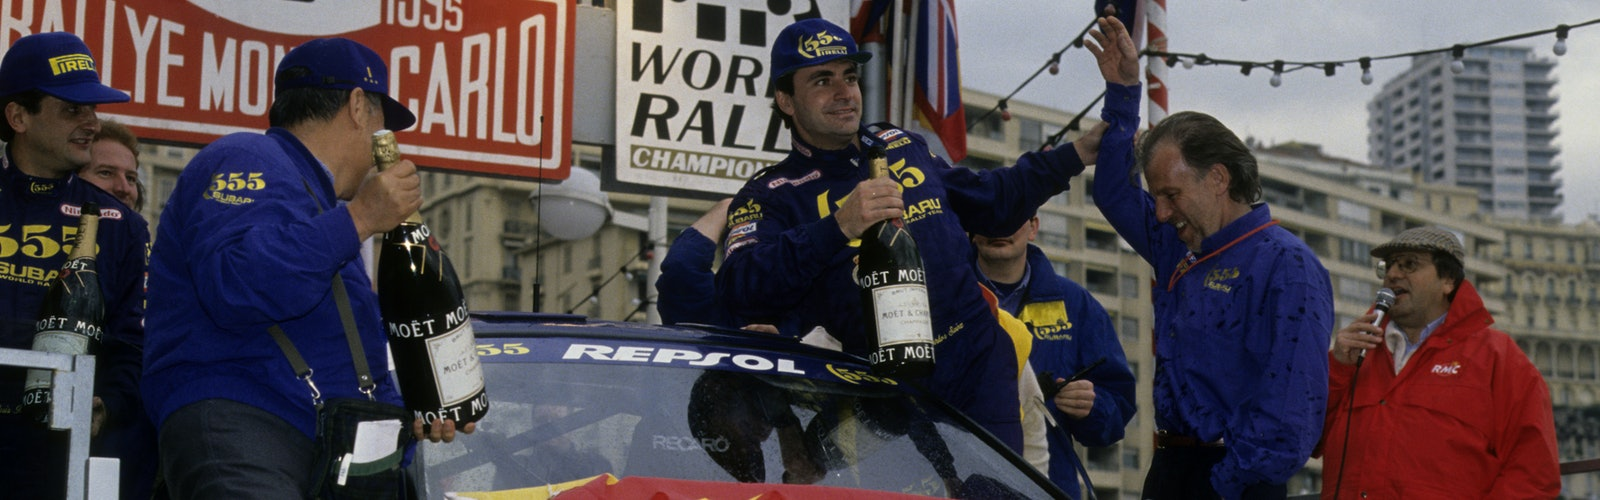 Carlos Sainz Subaru wins WRC Monte Carlo Rally 1995